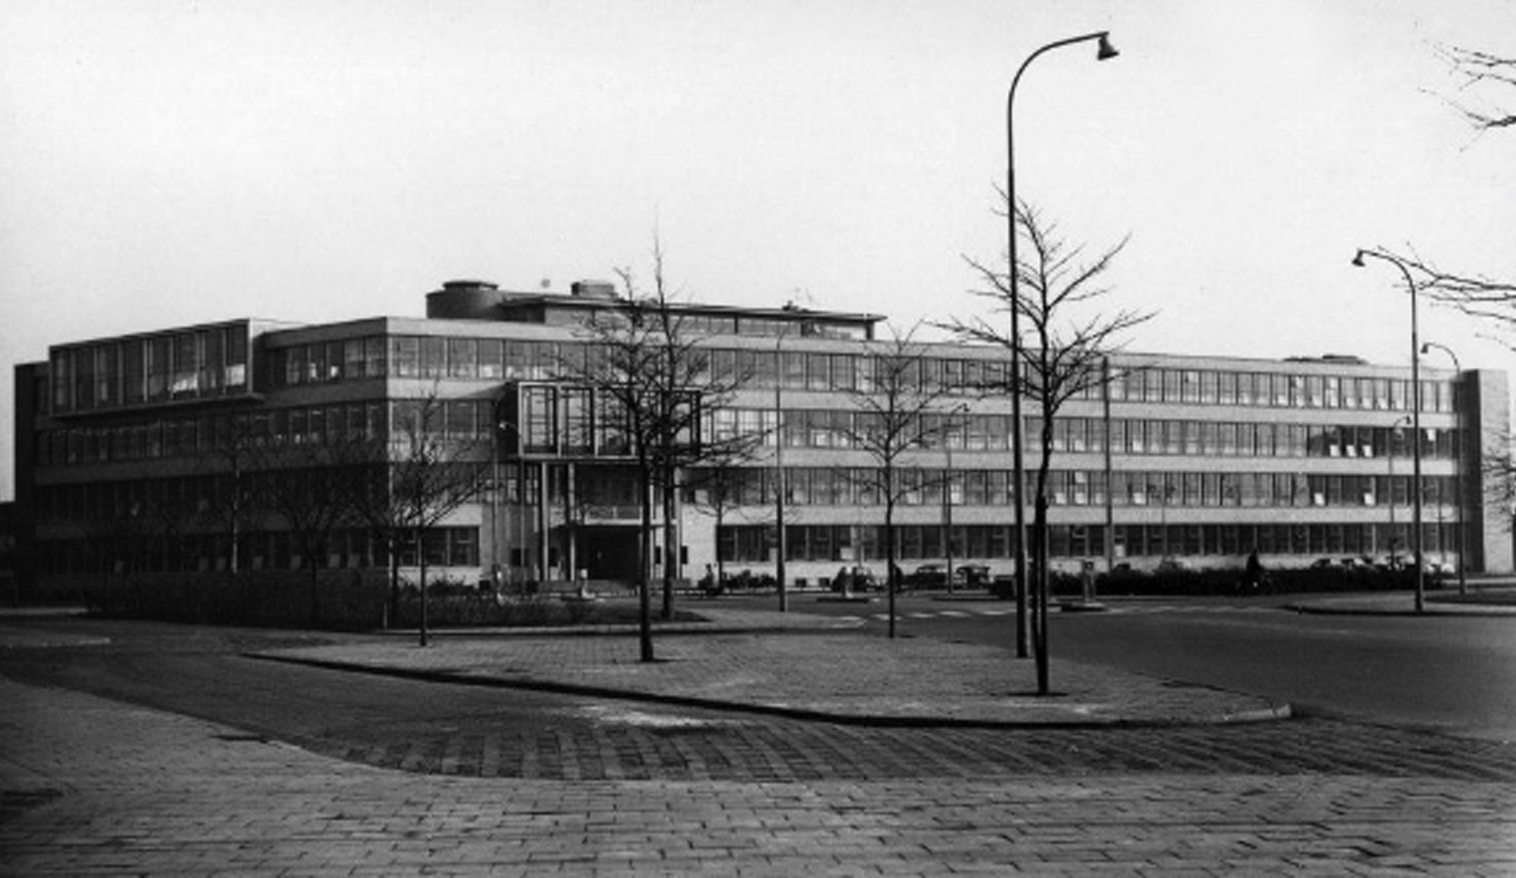 01 OPLarchitecten_Nijenoord1 Utrecht 1516×878-72dpi